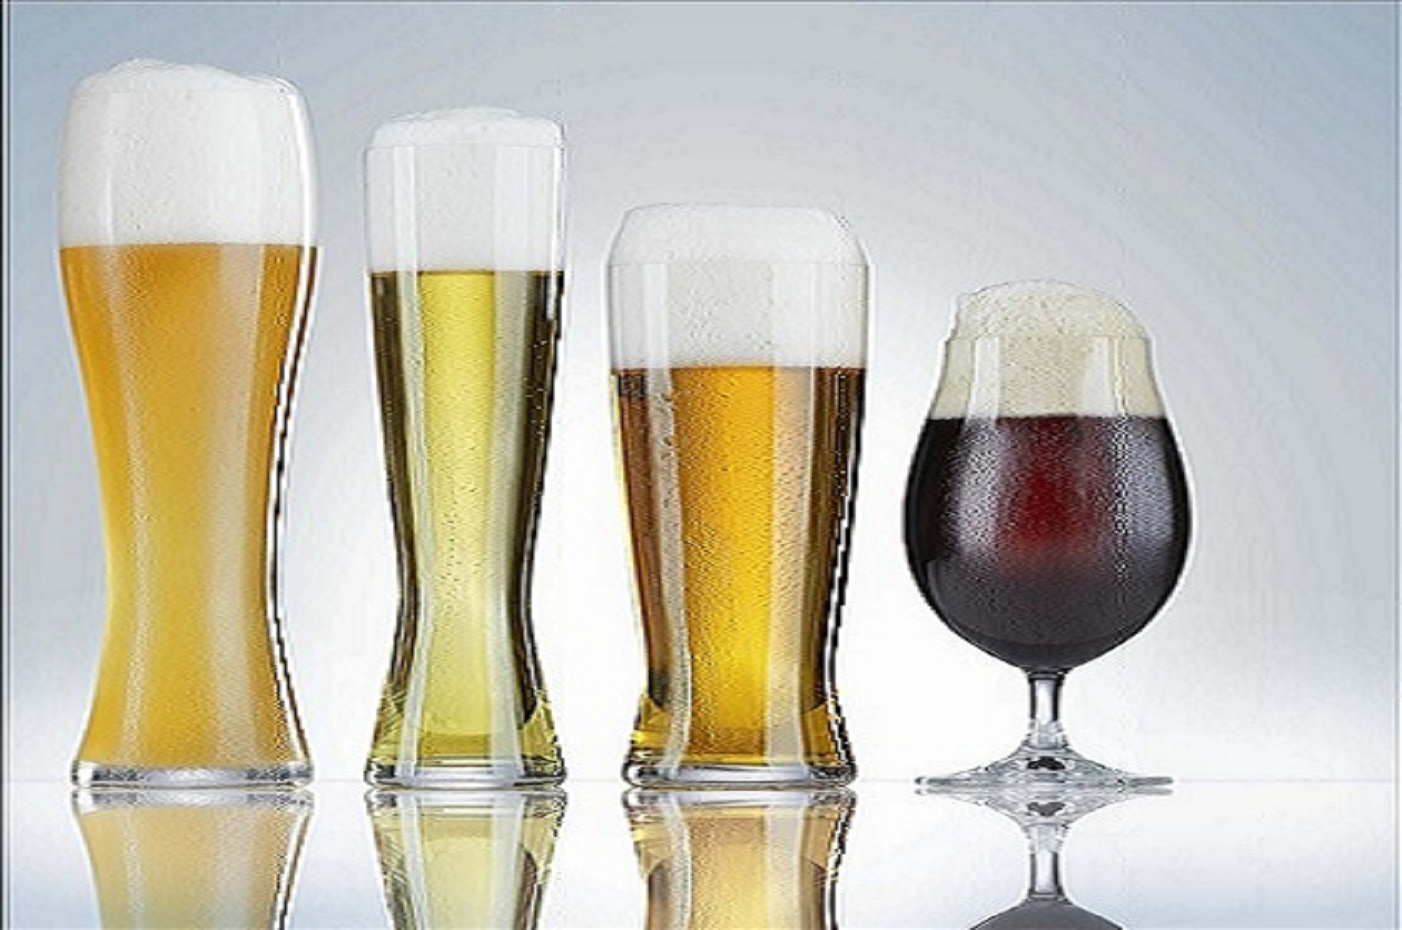 ALCOHOL (2)_1519221634842.jpg.jpg